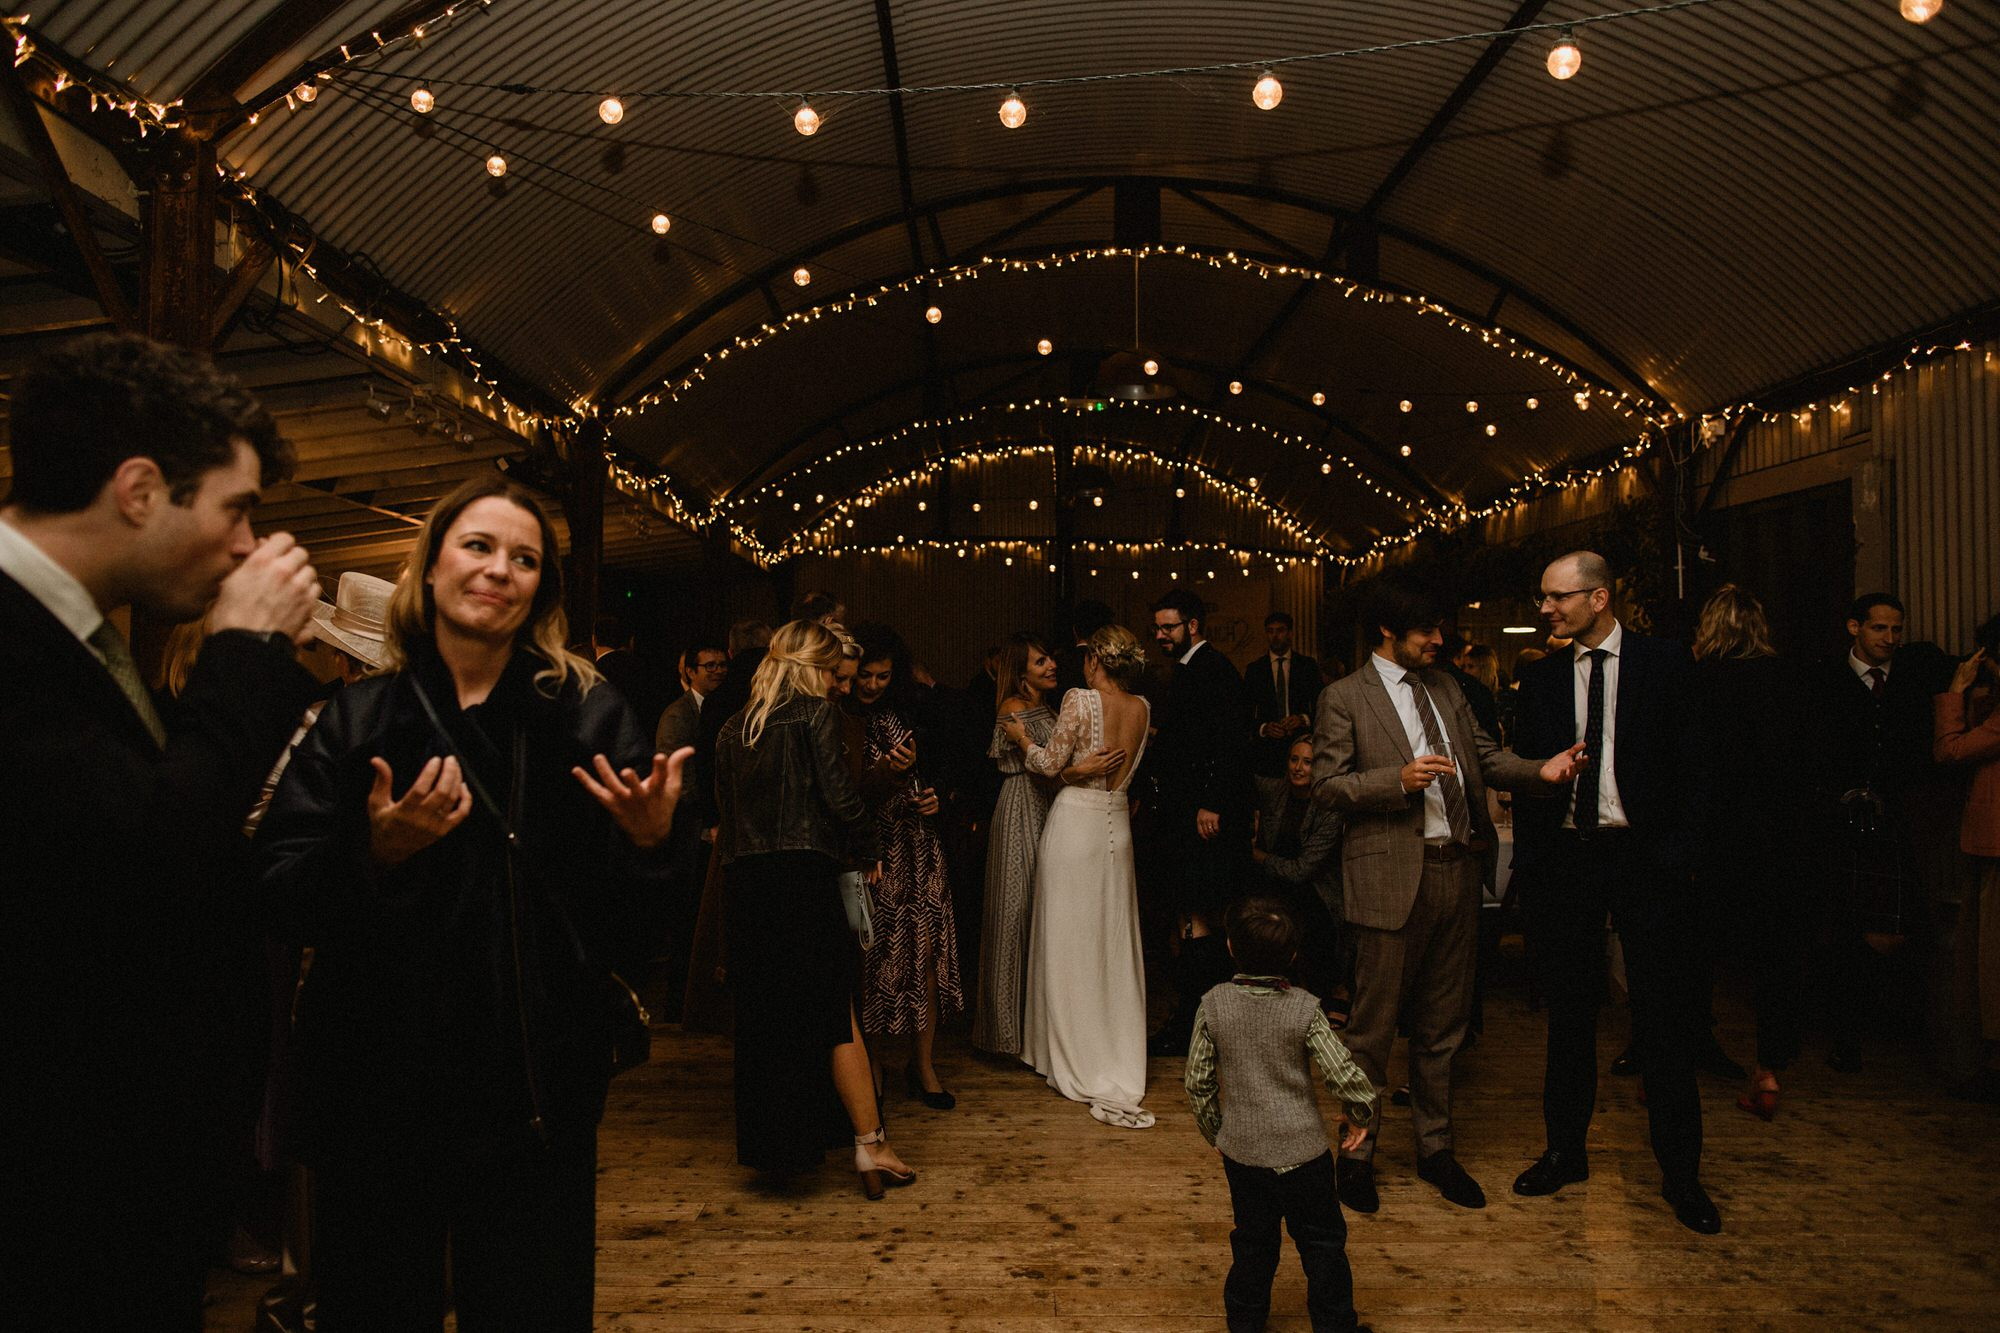 076 TIN SHED KNOCKRAICH WEDDING AUTUMN ZOE ALEXANDRA PHOTOGRAPHY